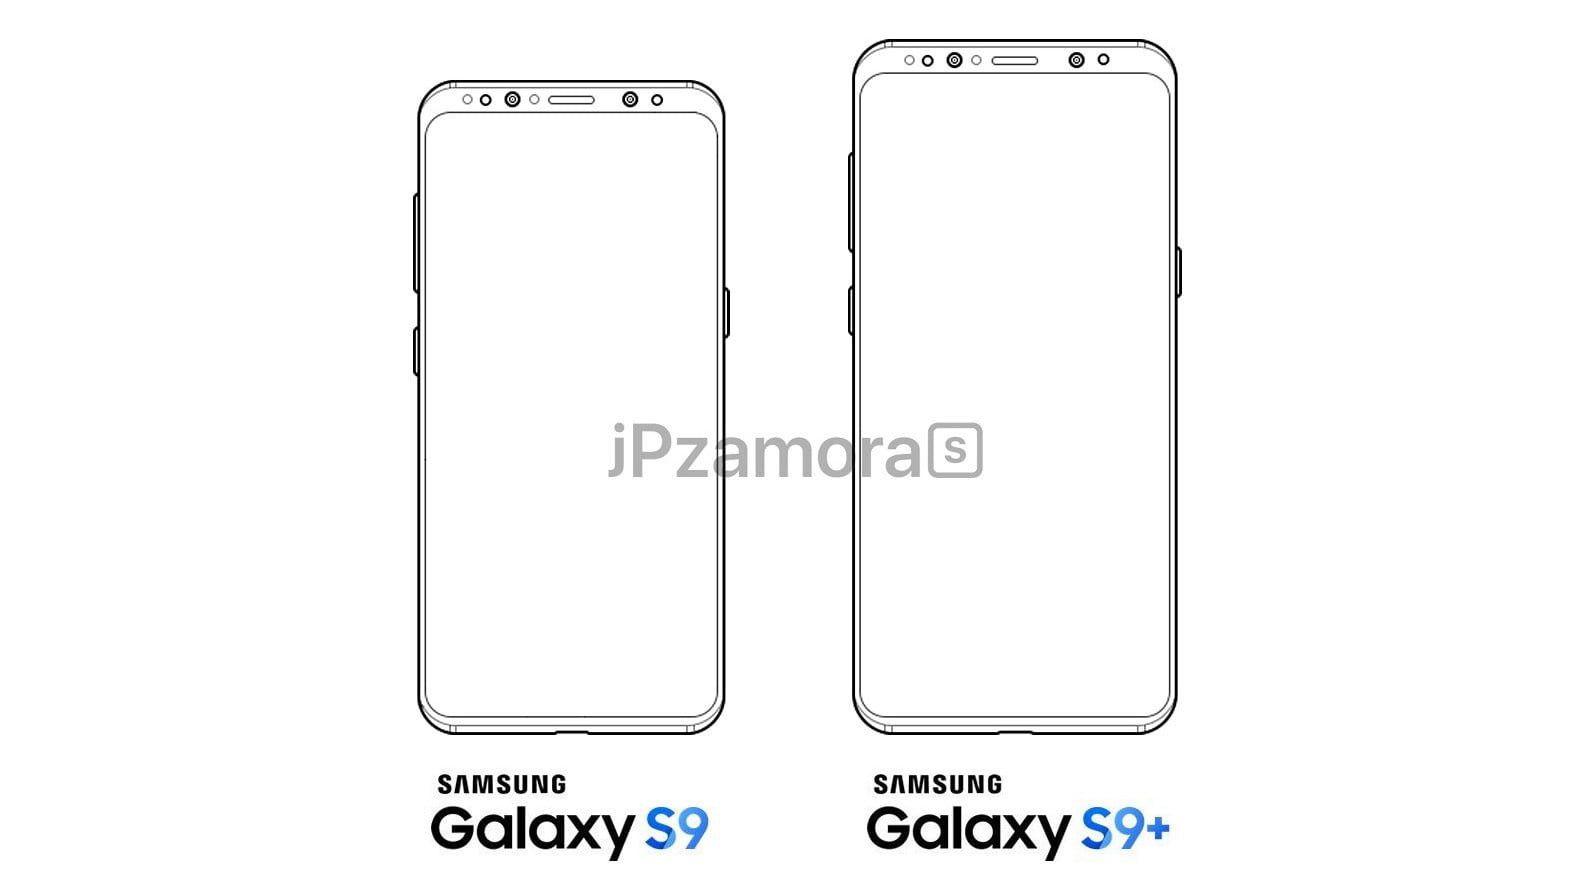 Samsung Galaxy S9: News and rumors